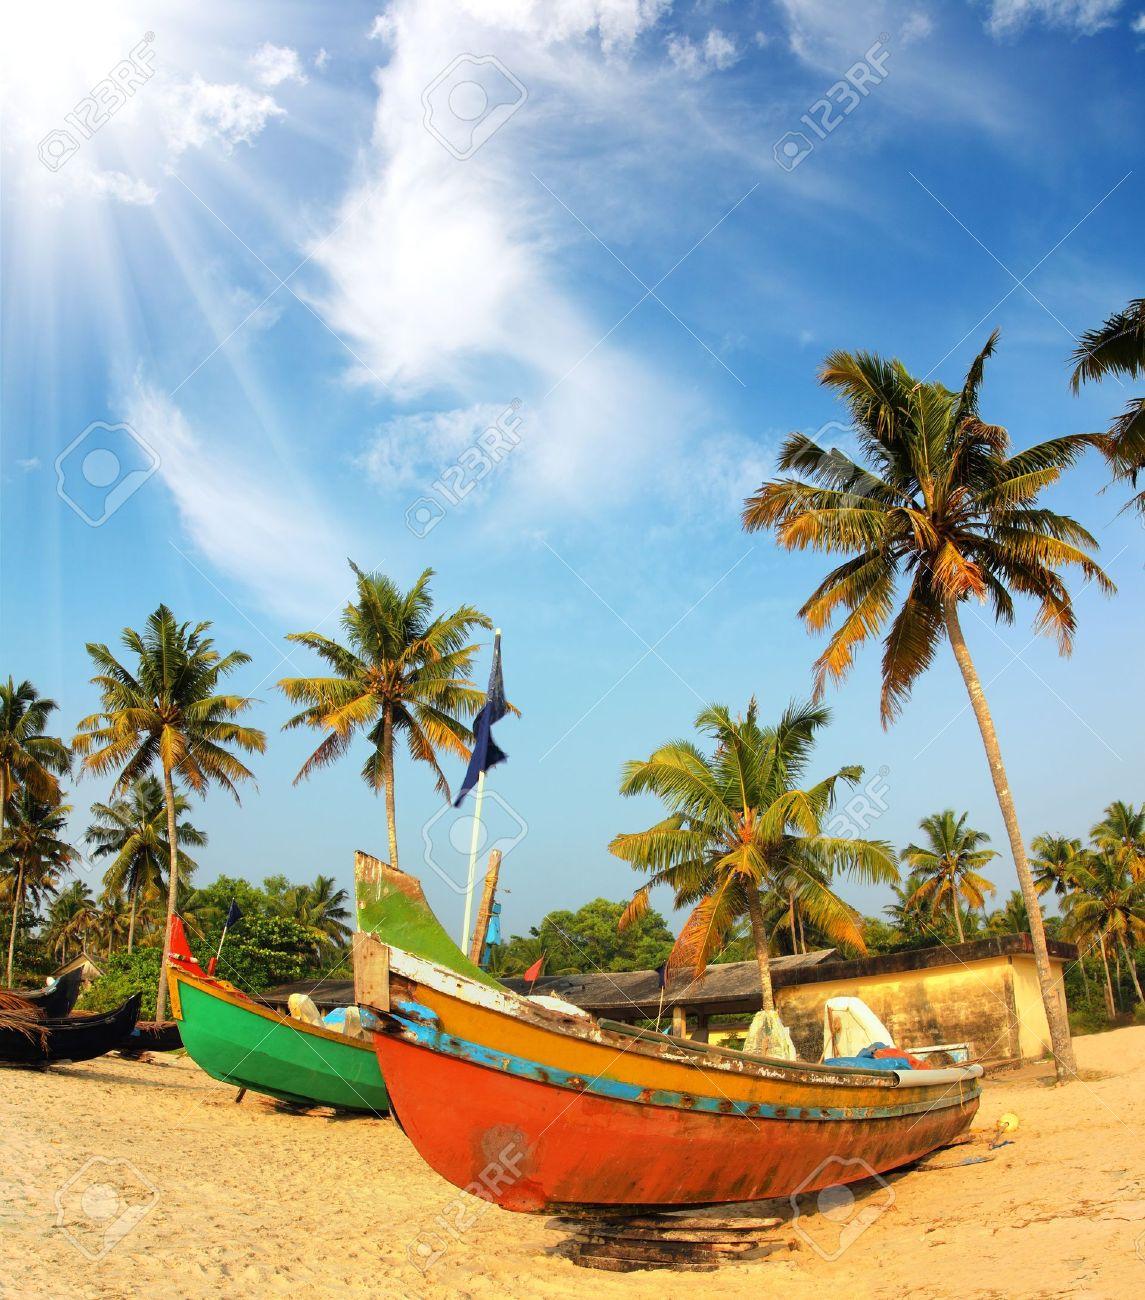 old fishing boats on beach - kerala india - 19933245